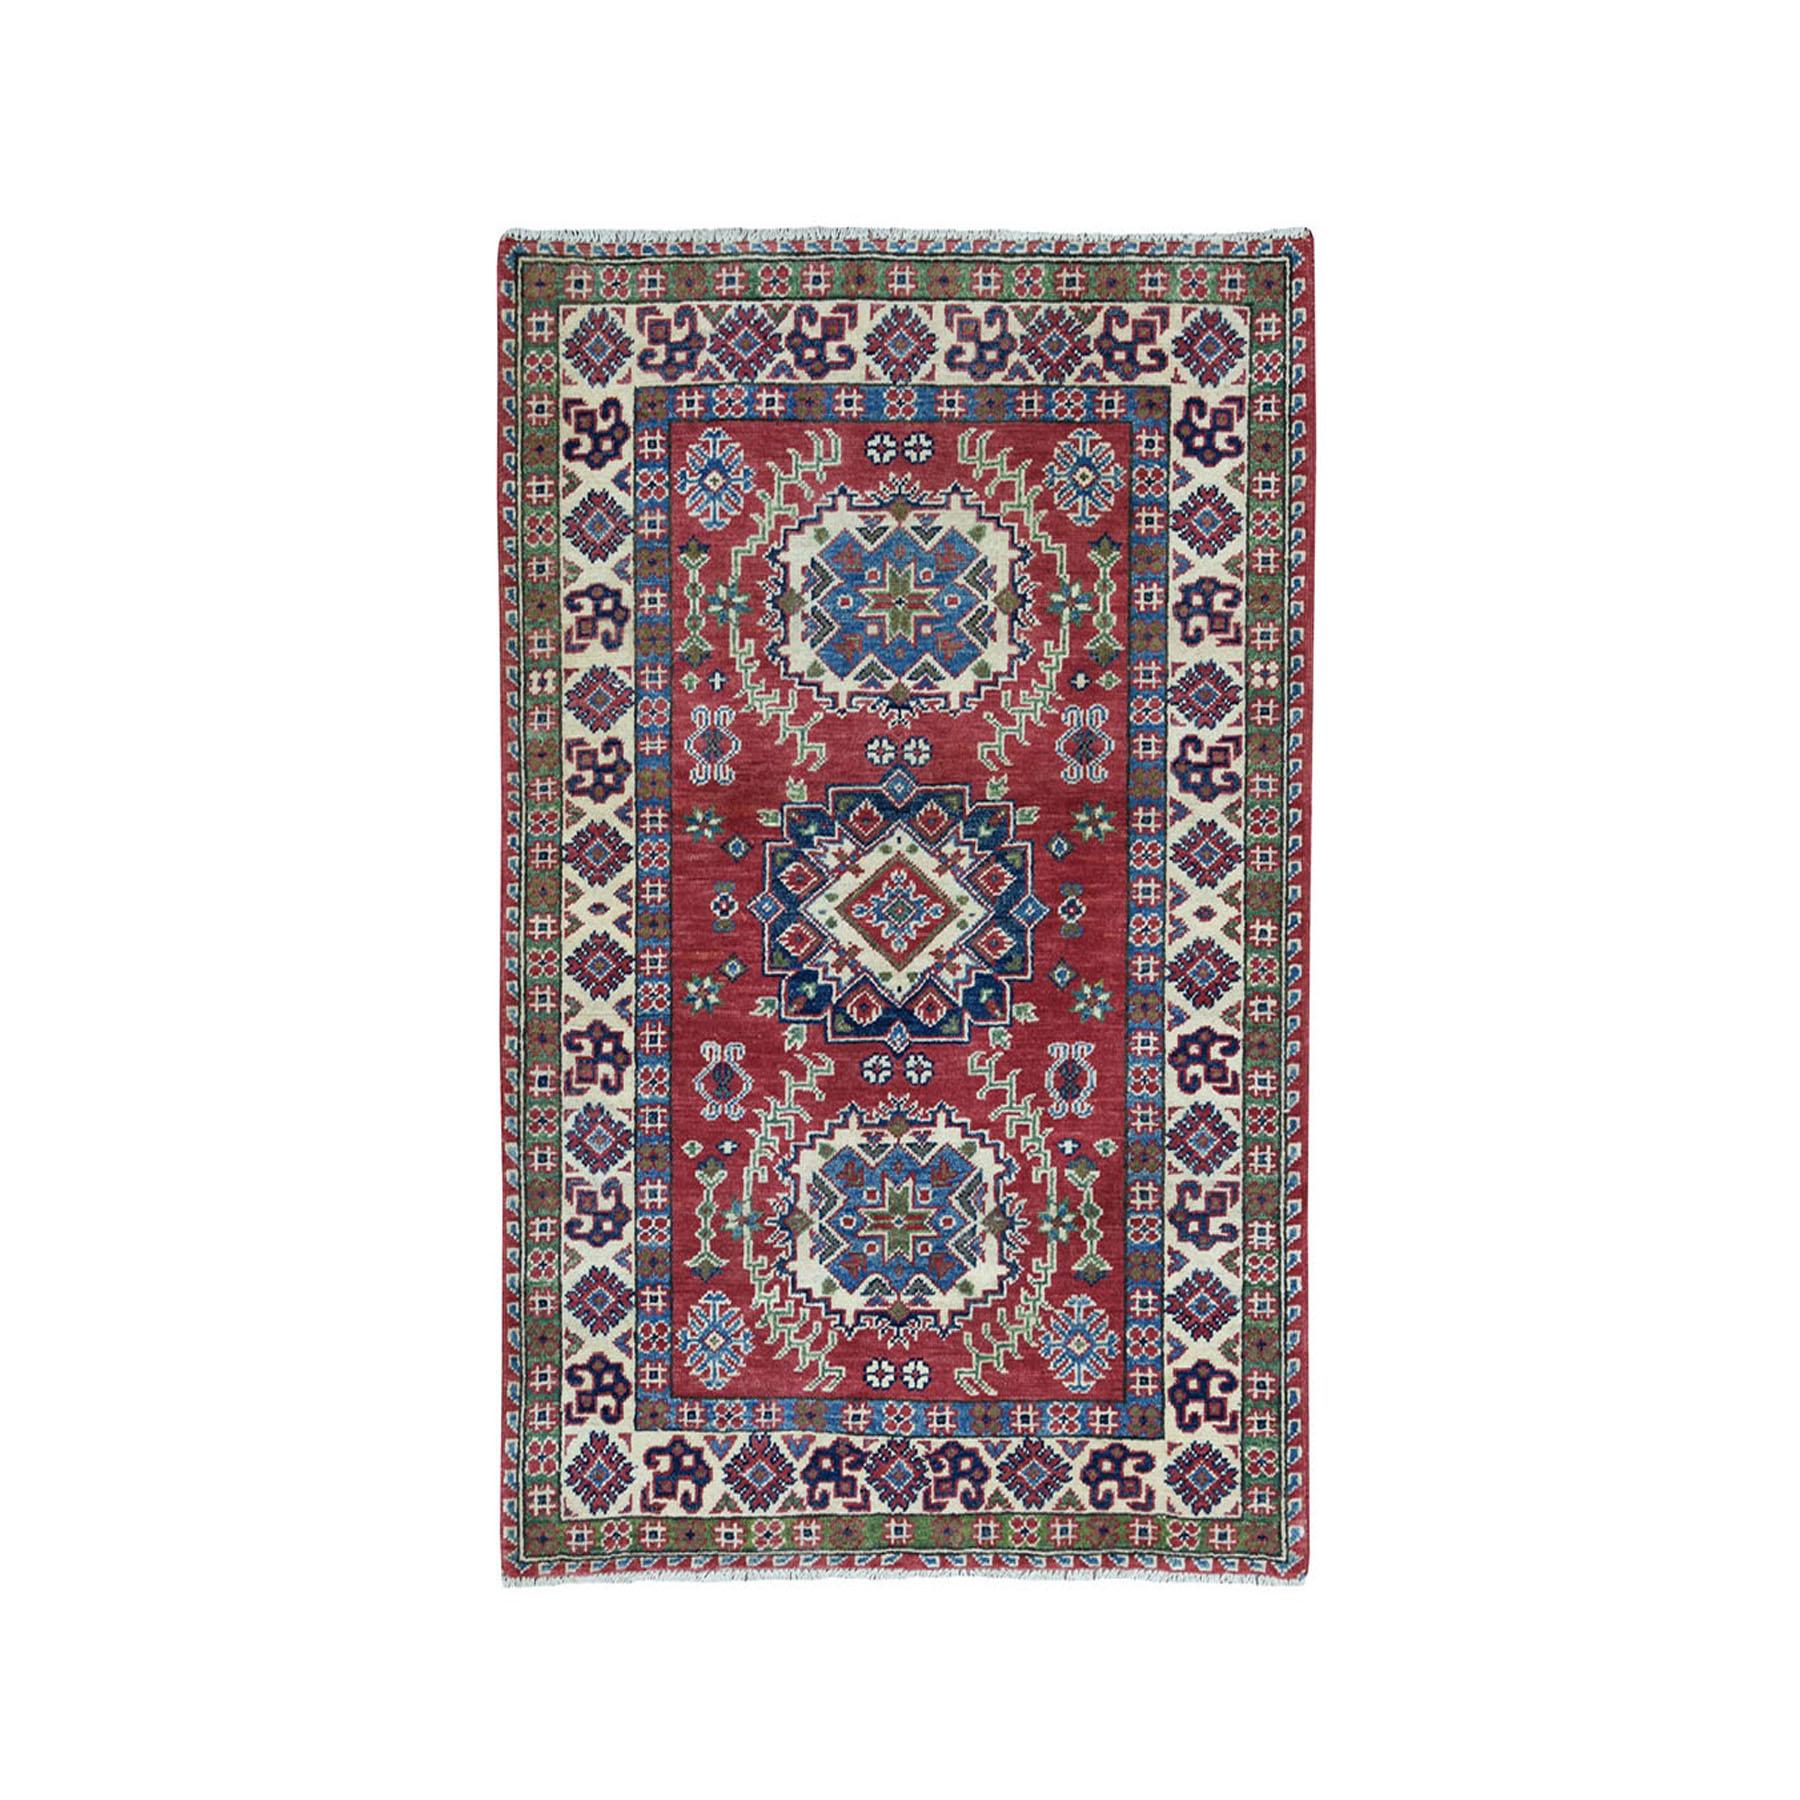 "3'3""X4'5"" Blue Geometric Design Kazak Pure Wool Hand-Knotted Oriental Rug moae08ab"